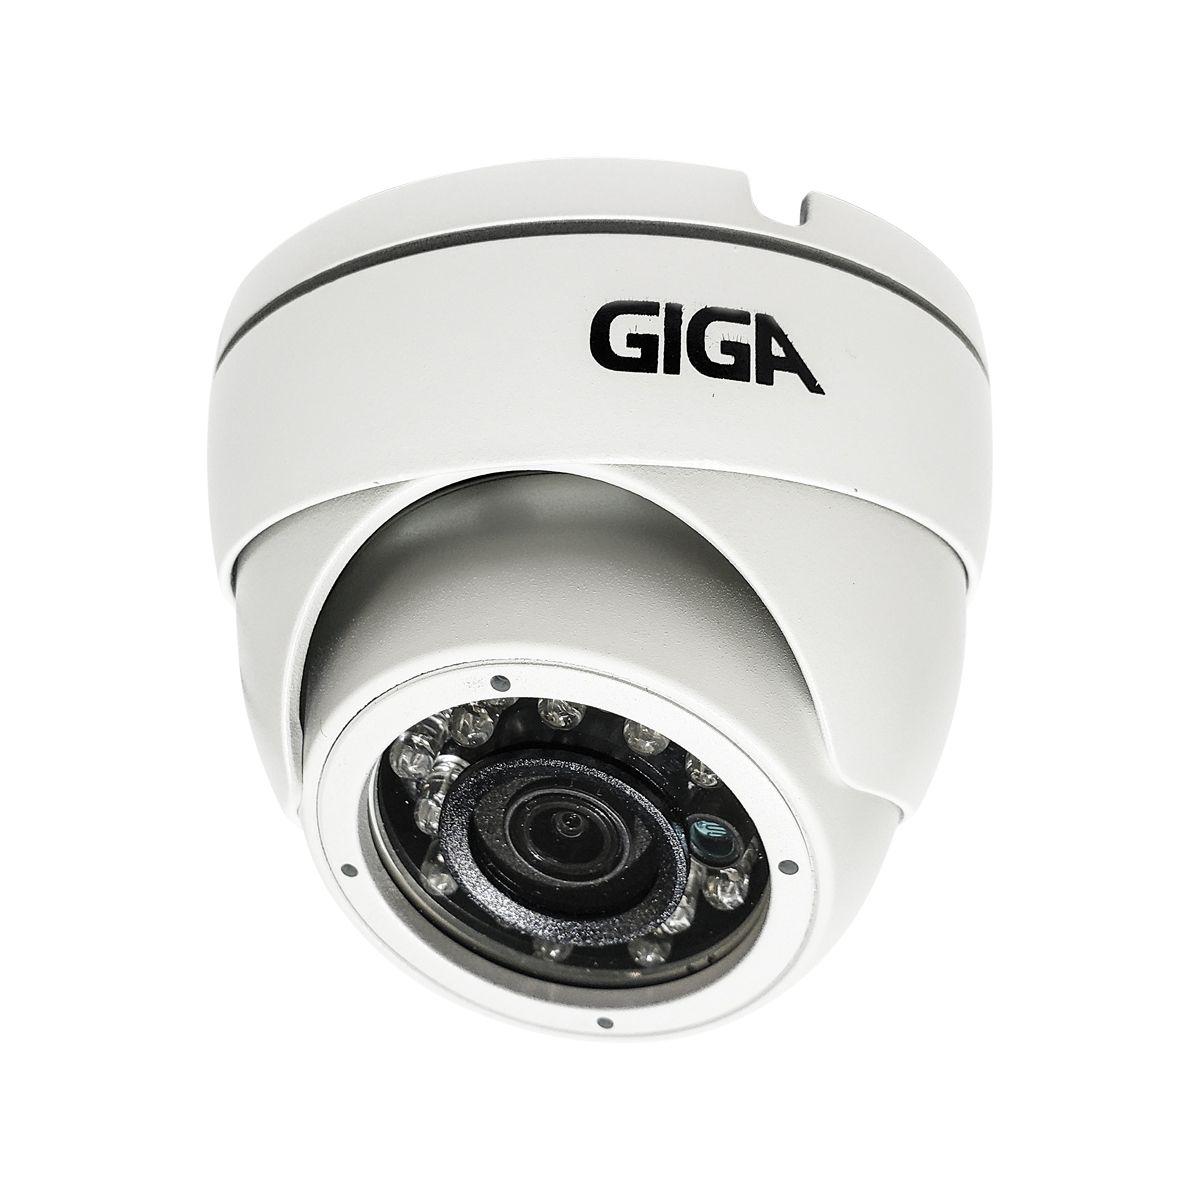 CÂMERA GIGA GS0041 DOME OPEN HD IR 30M (4MP | IP66 | 4MM | PLAST)  - CFTV Clube | Brasil